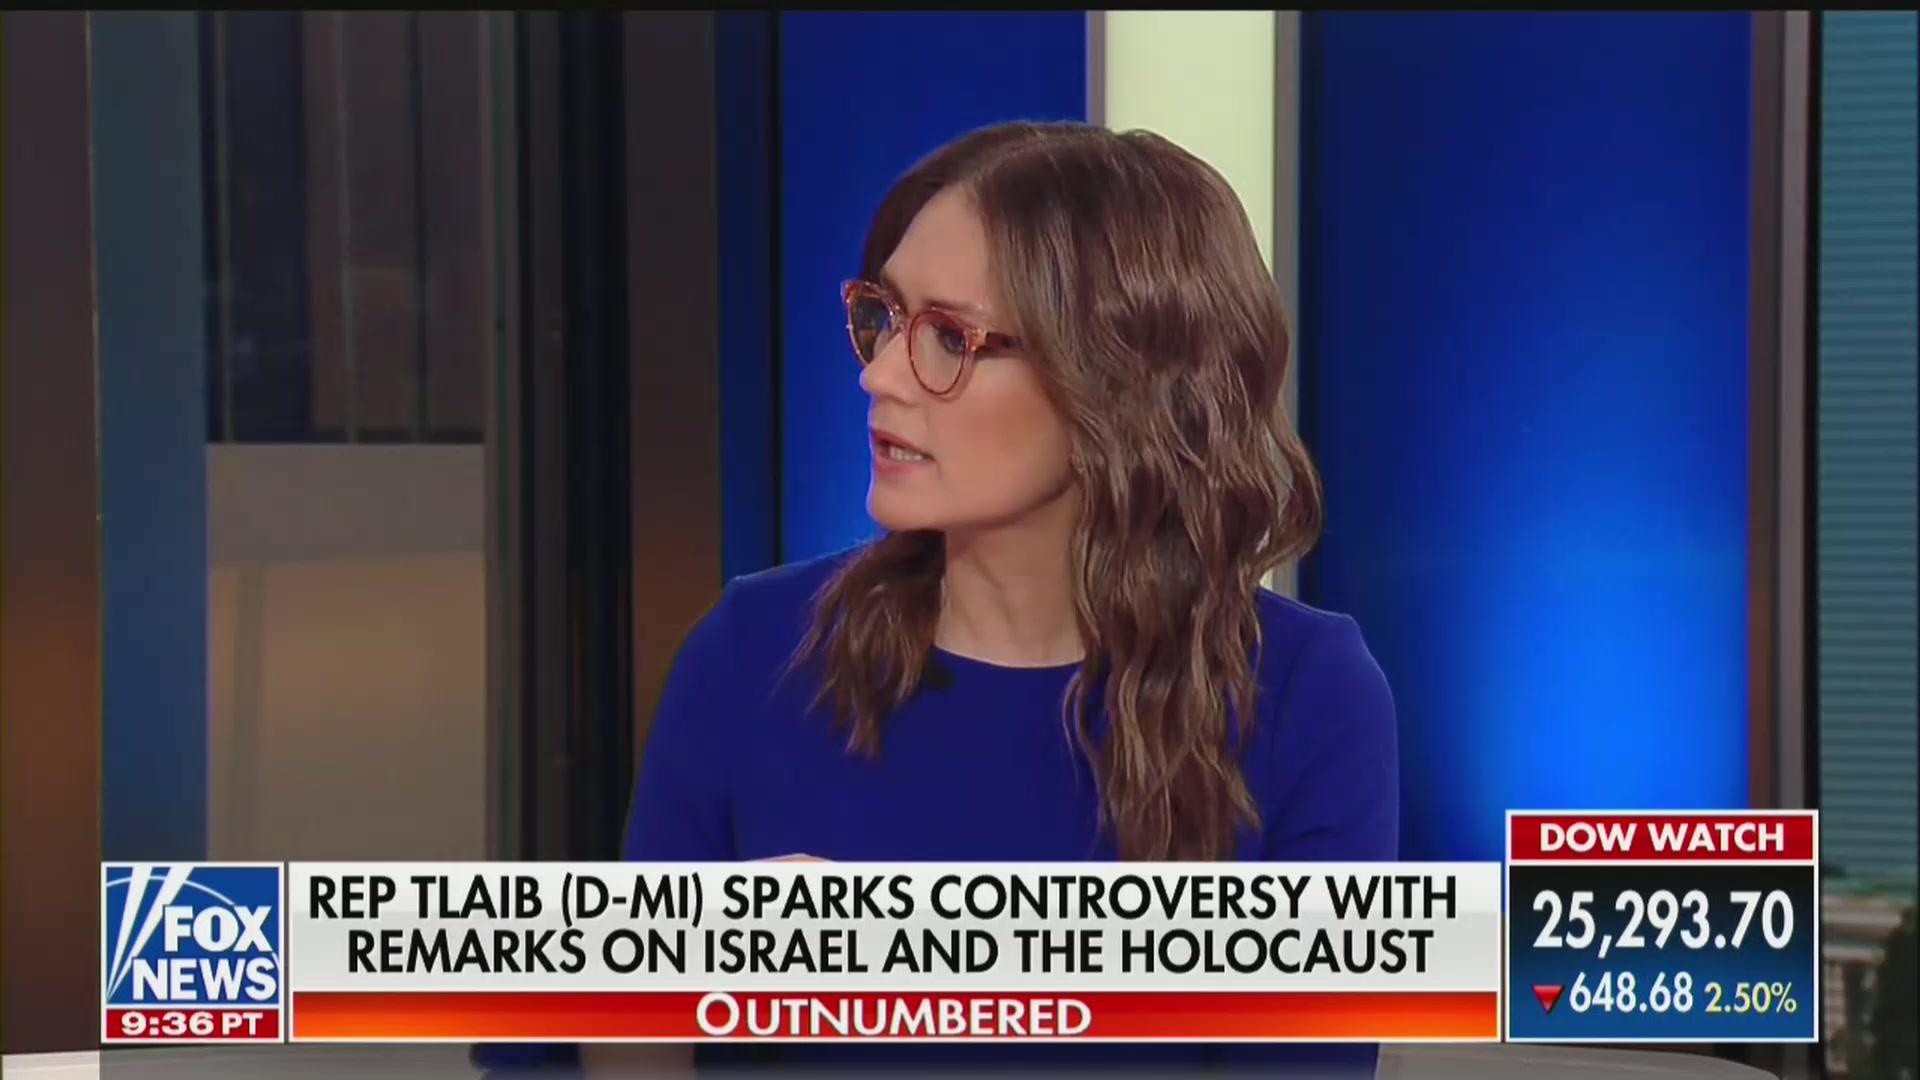 Fox News' Jessica Tarlov: 'It's Republicans' Fault for Twisting' Rashida Tlaib's Holocaust Comments